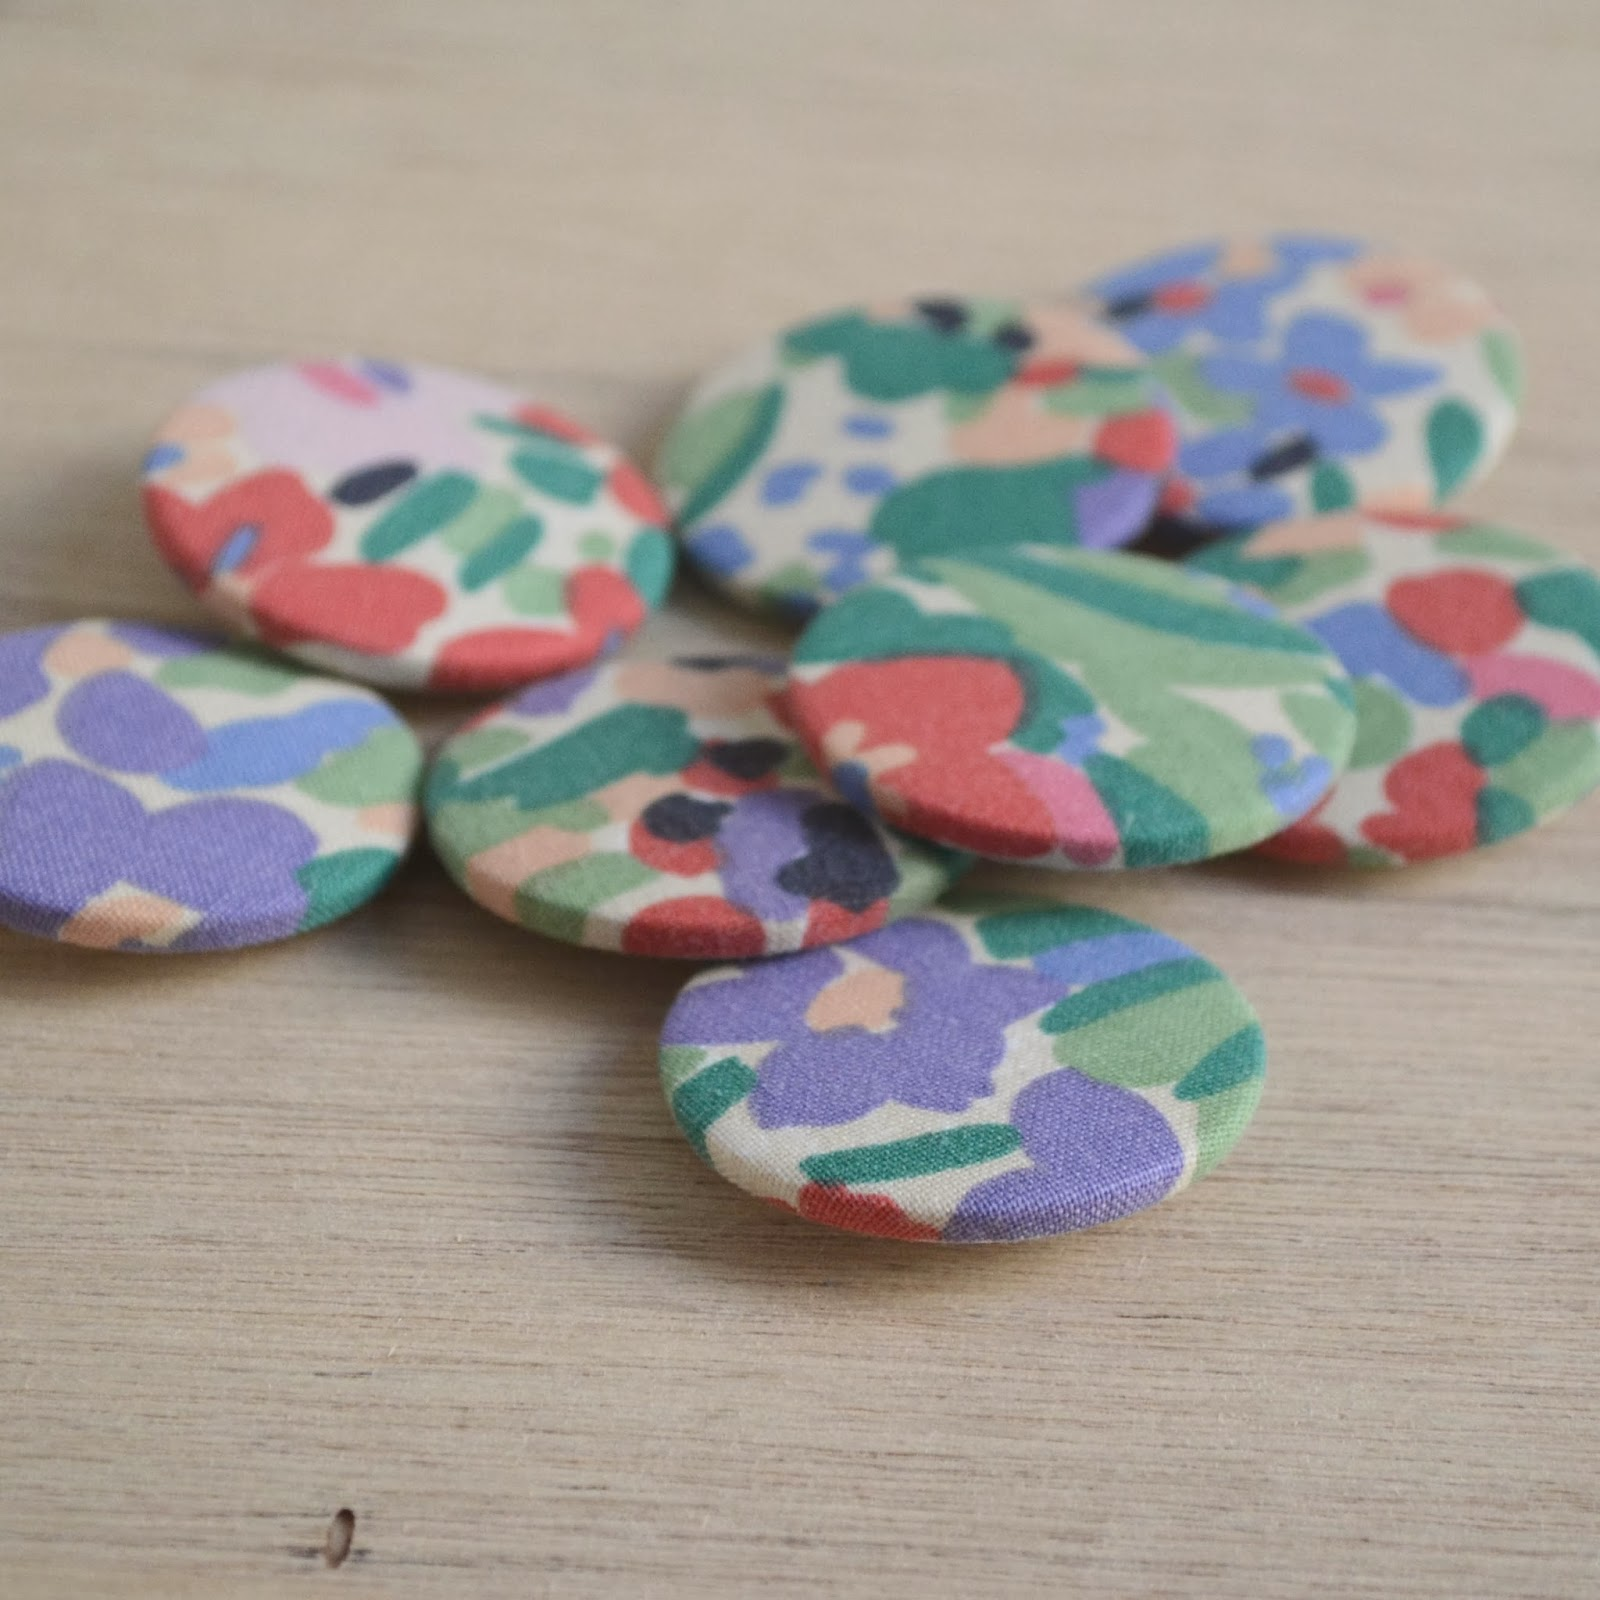 https://www.etsy.com/listing/175734245/pretty-vintage-floral-fabric-badges?ref=listing-shop-header-3